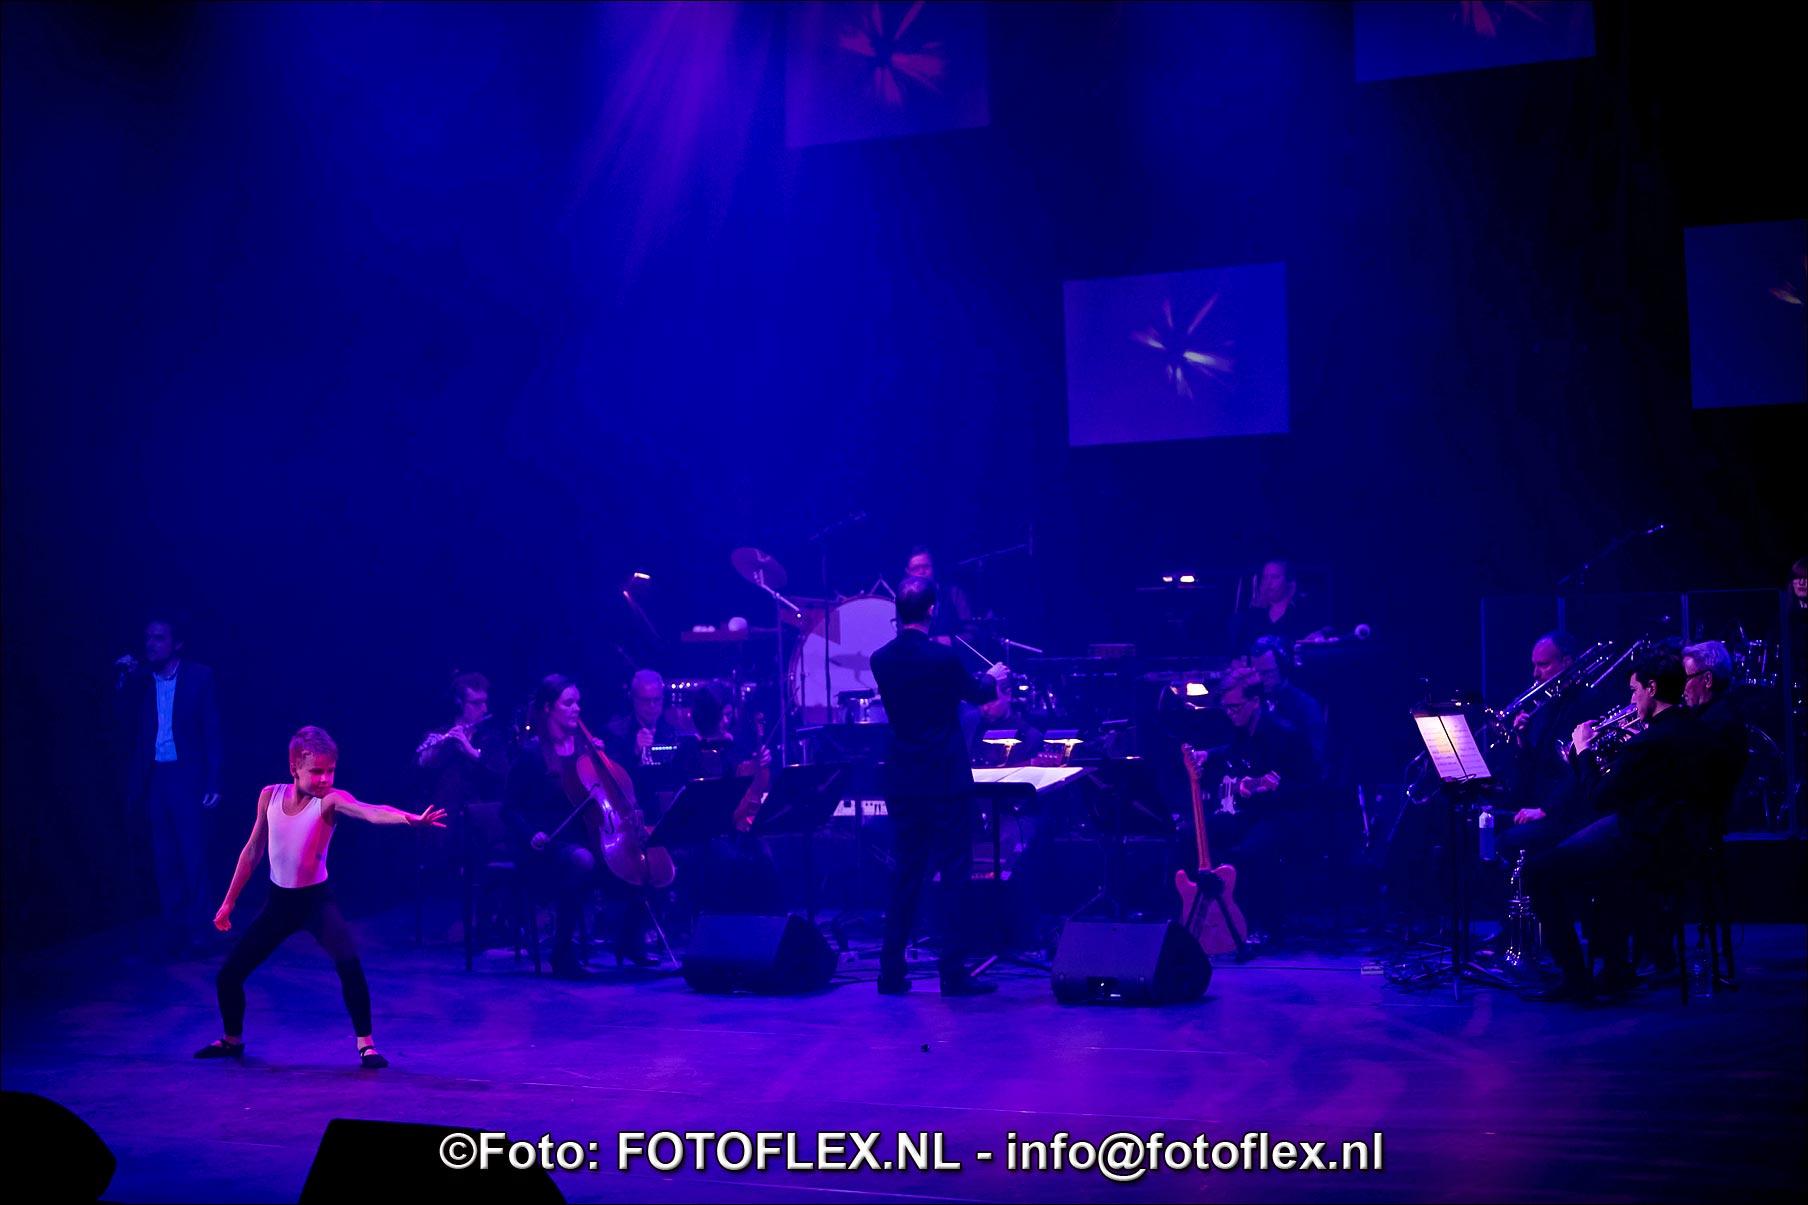 0441-CopyrightFOTOFLEX.NL07012020